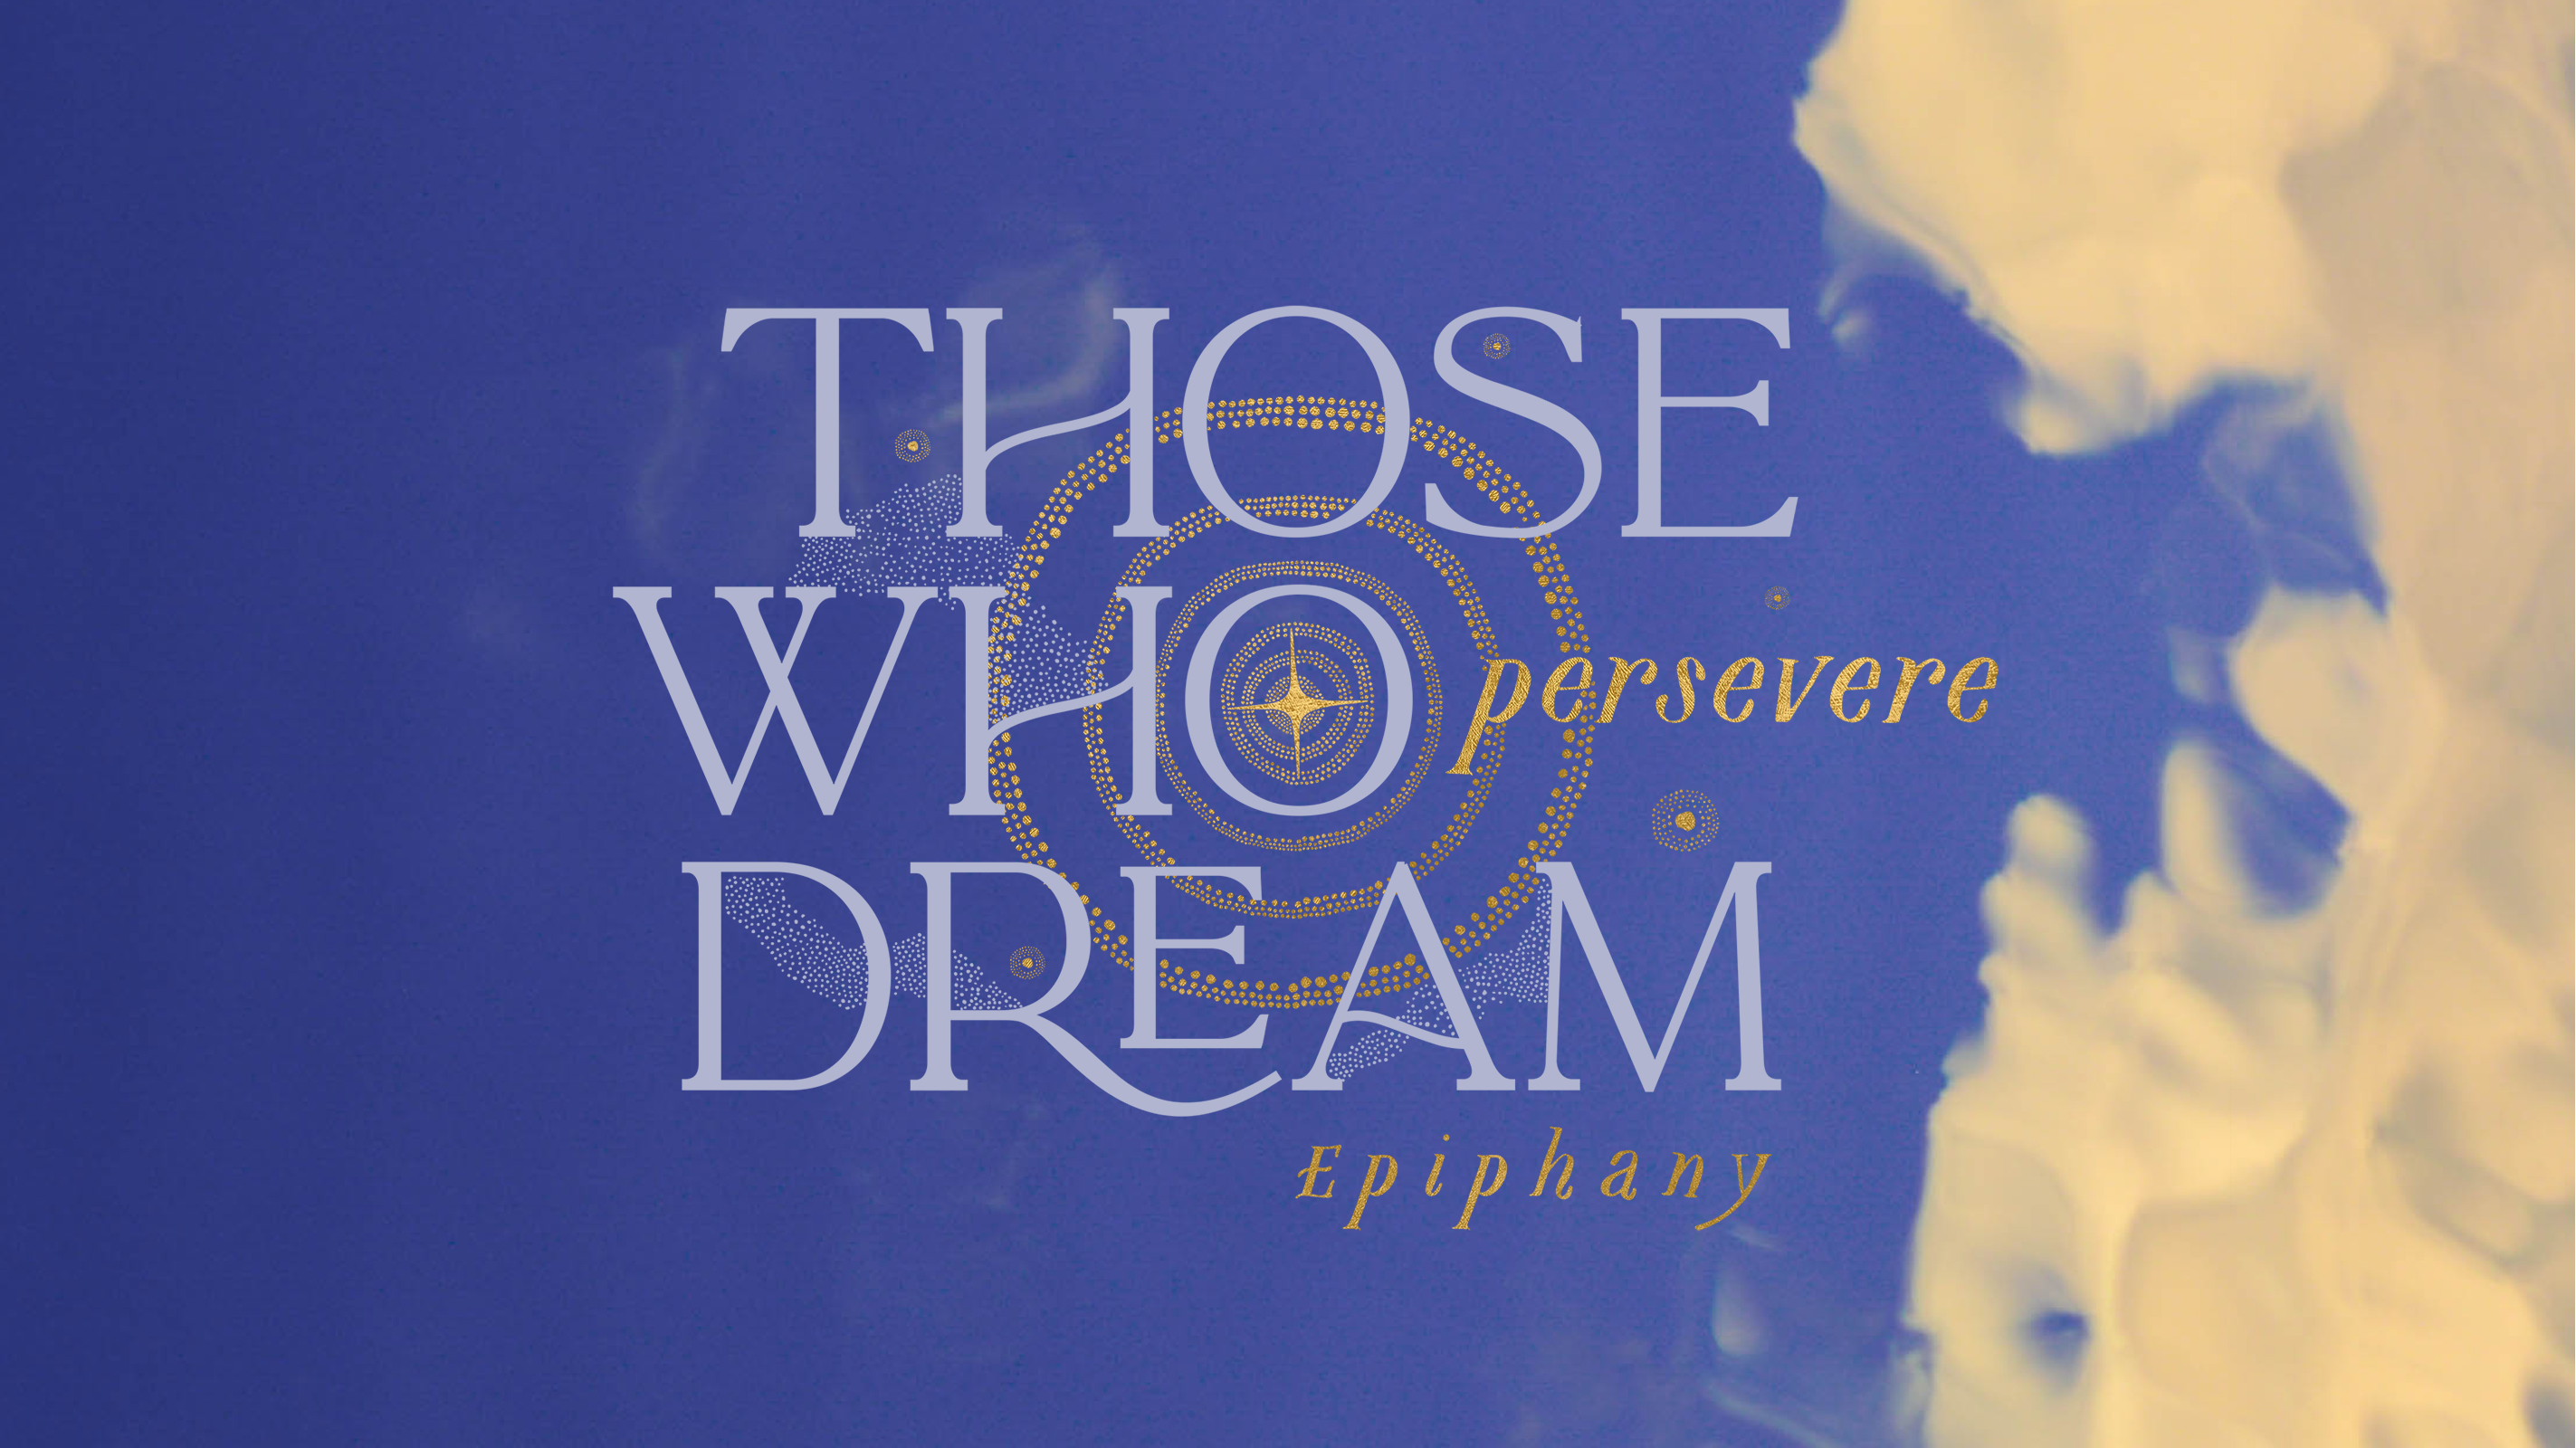 Those Who Dream Persevere